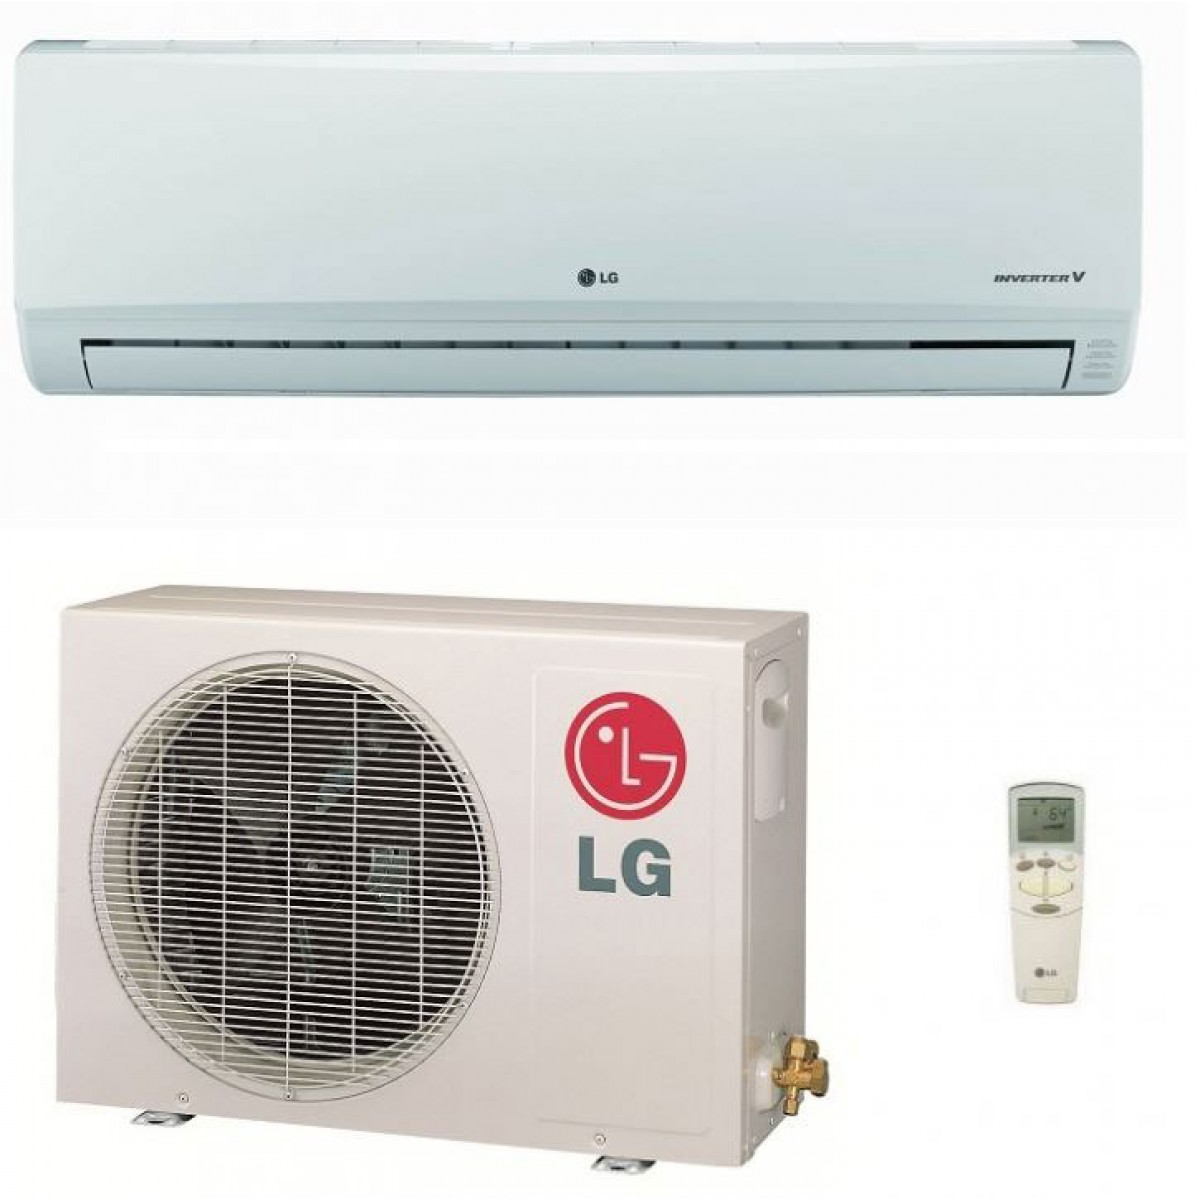 refrigeration and air conditioning services in nairobi kenya